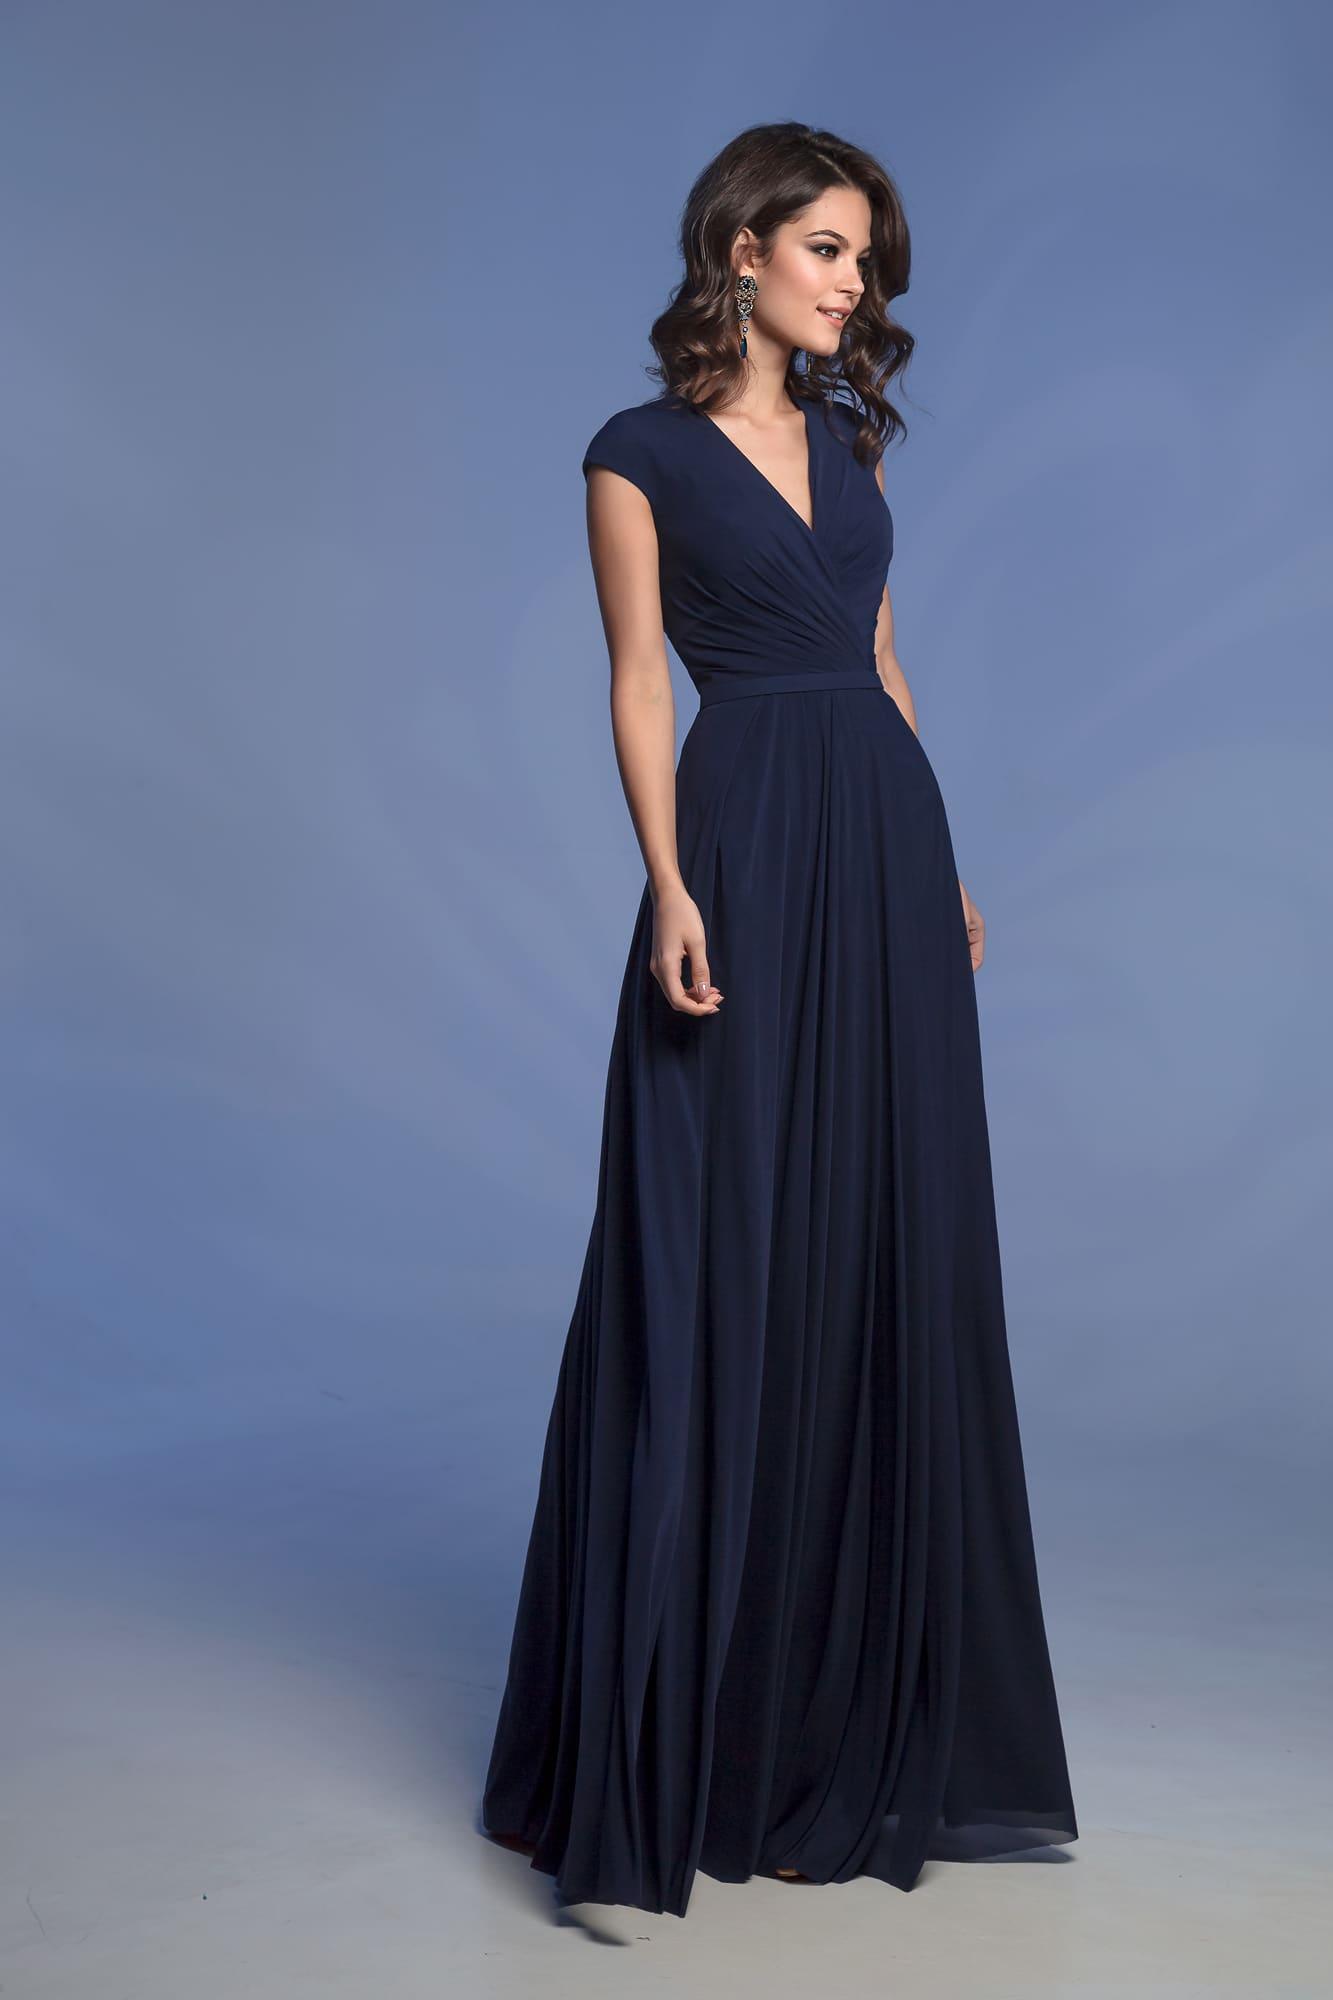 9ddb018e63b Темно-синее коктейльное платье Nora Naviano 31251 navy ▷ Свадебный ...